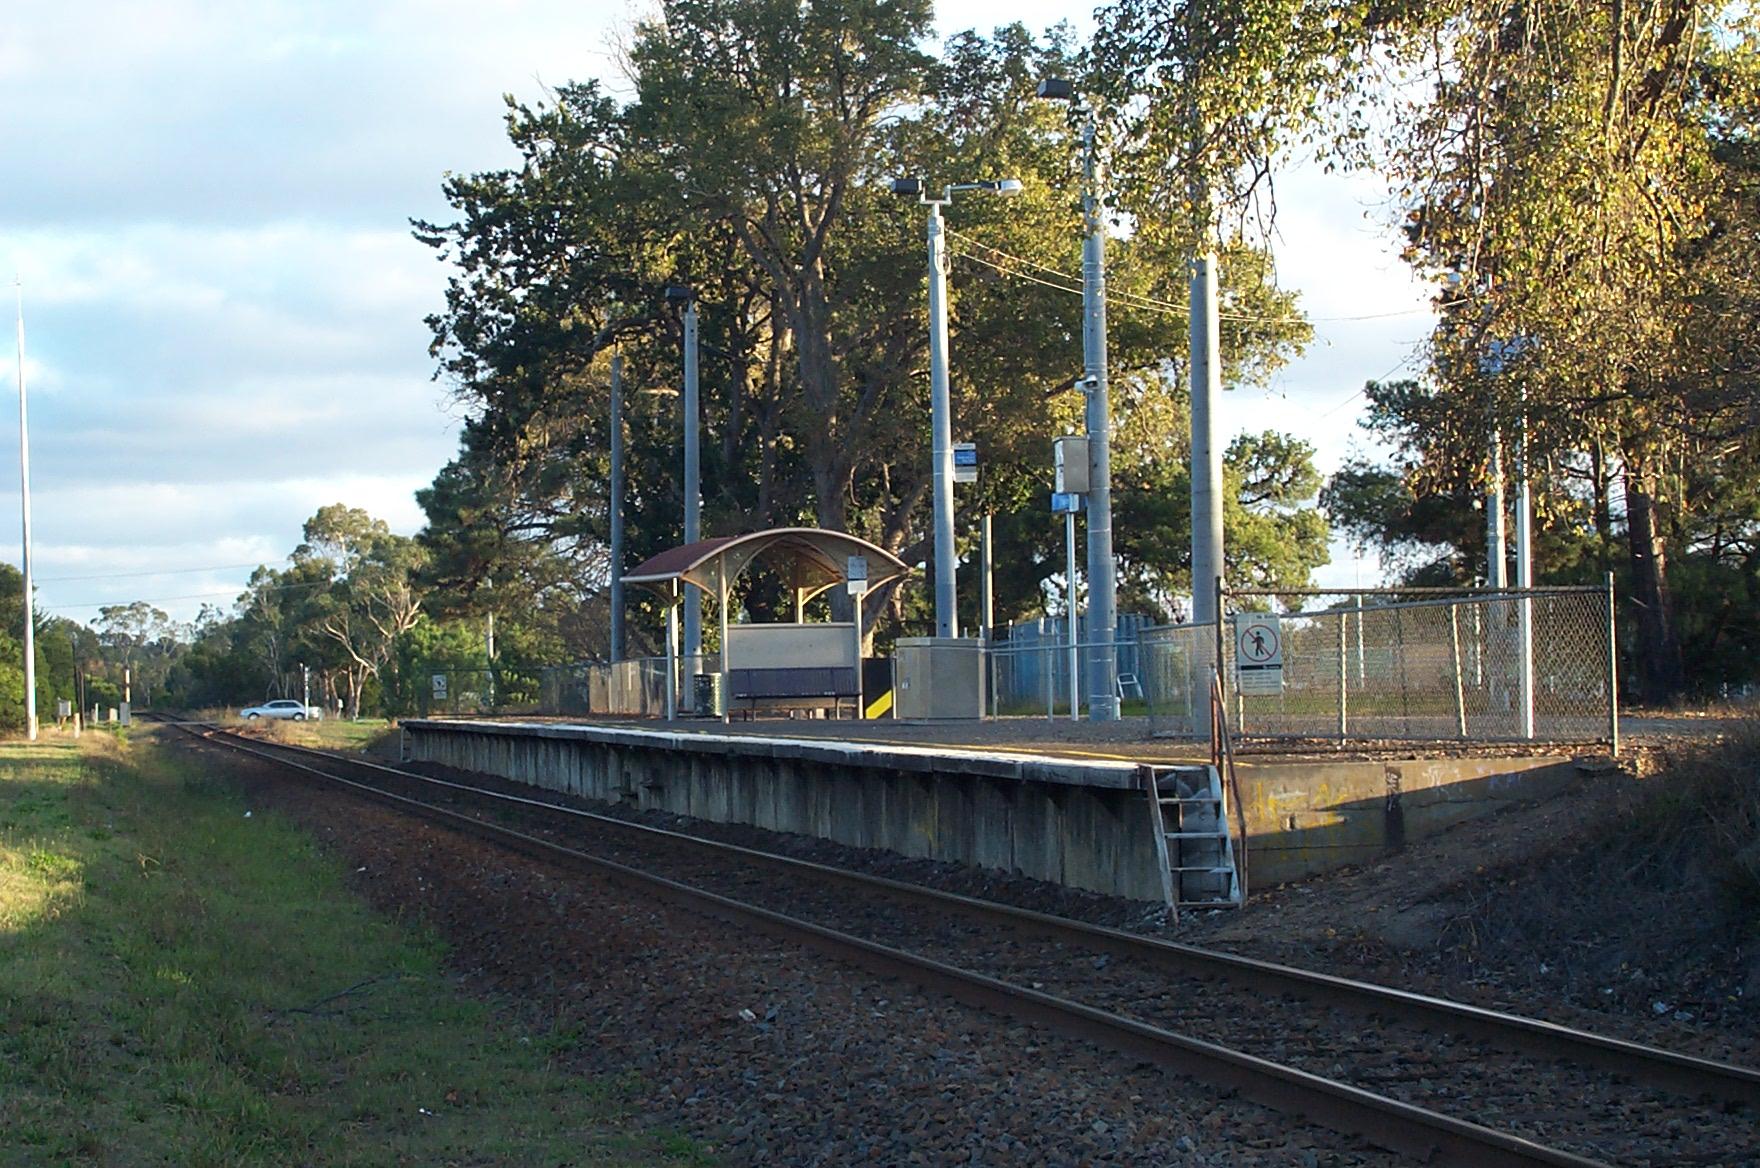 Baxter_railway_station__Melbourne.jpg